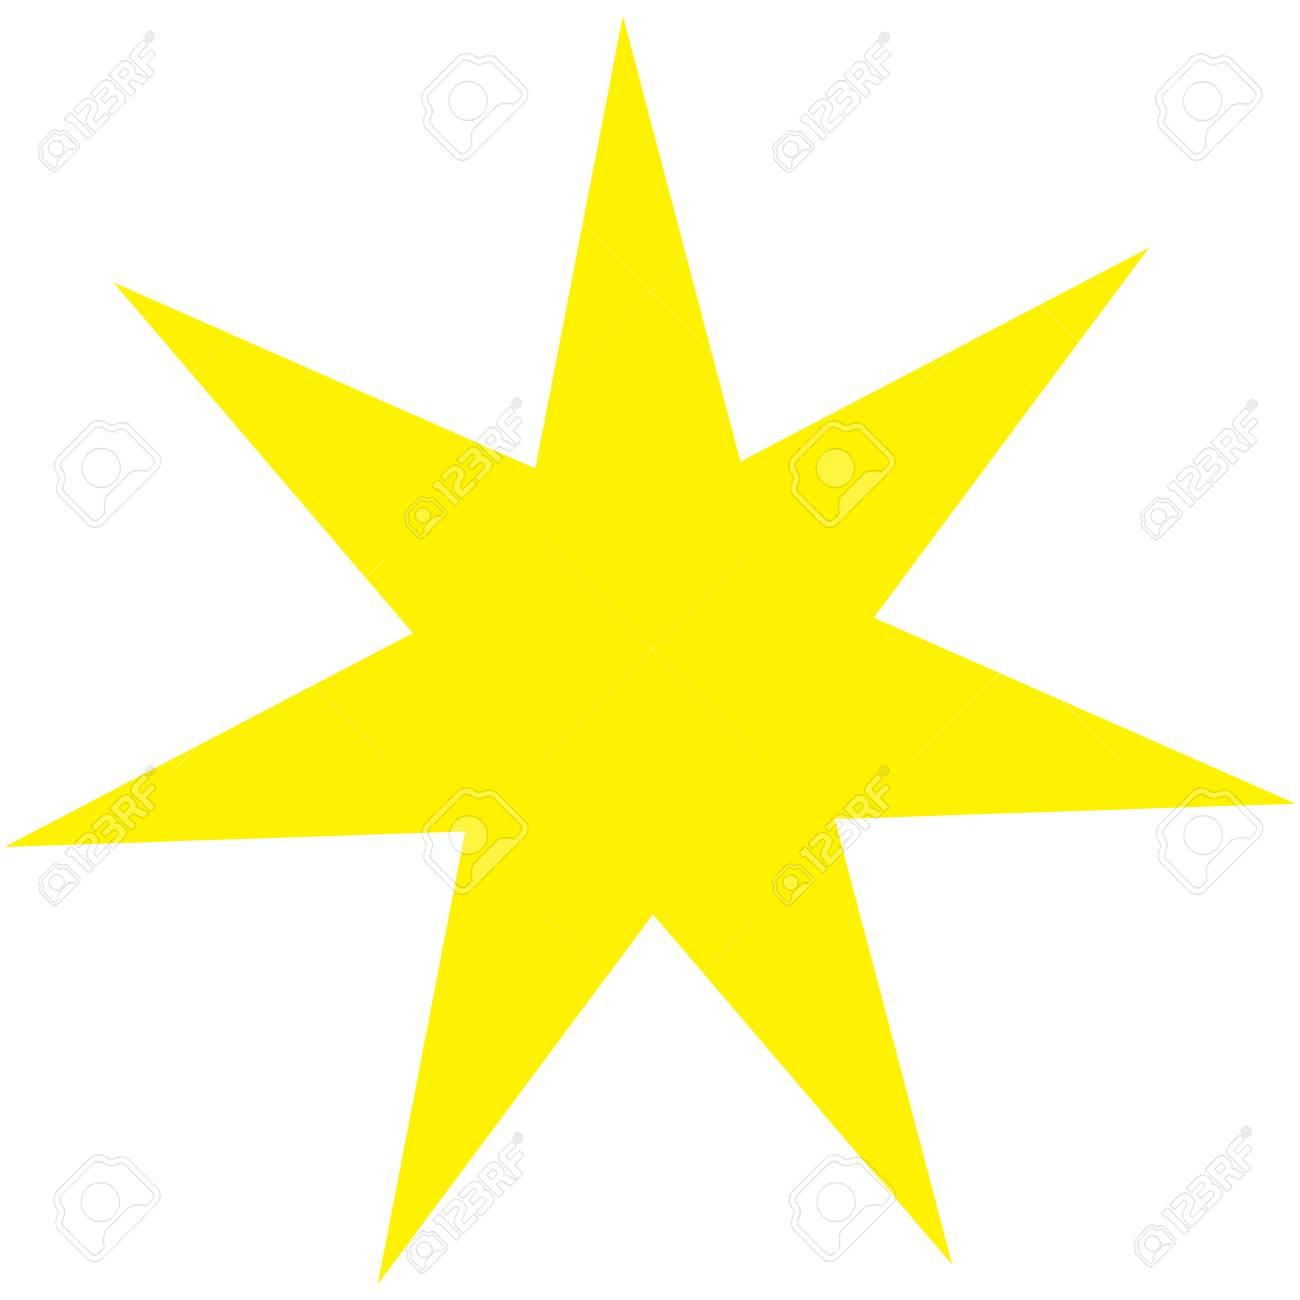 Sacred Geometric Symbol Of Seven Pointed Star Plexus. Golden ...